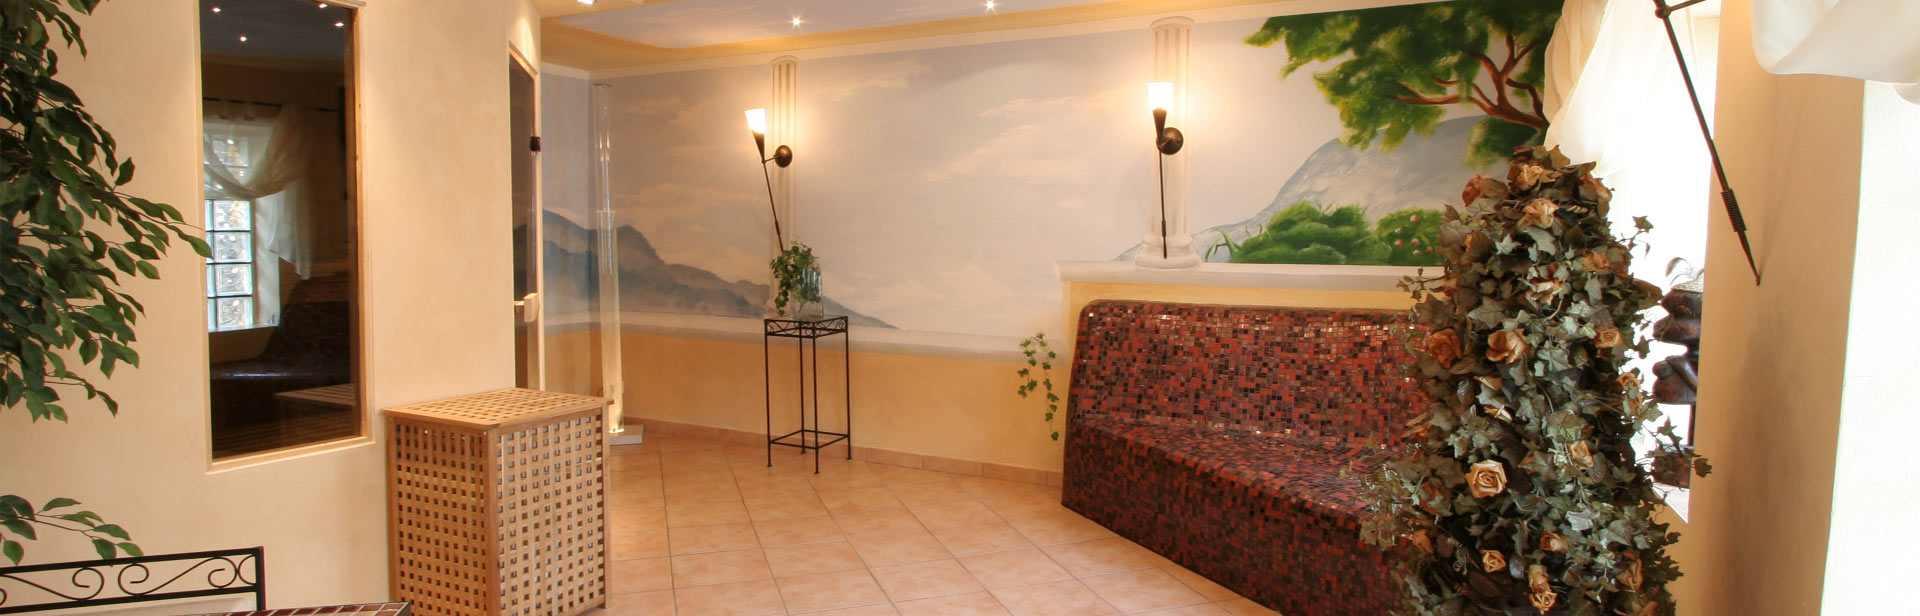 reservierung im hotel residence bremen n he des congresszentrum. Black Bedroom Furniture Sets. Home Design Ideas